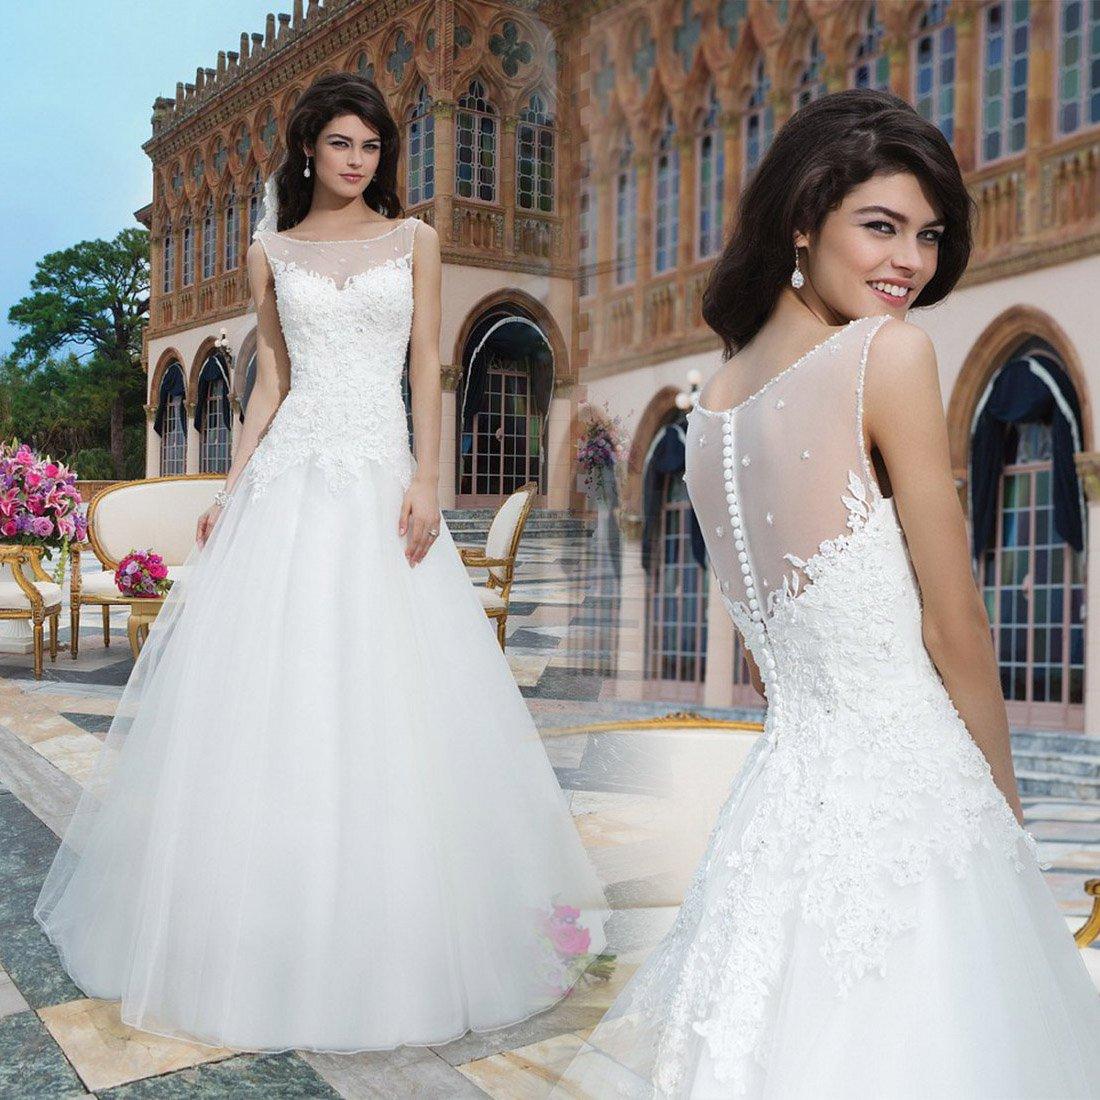 White Ball Gown Wedding Dress Plus Size Bridal Gown lace wedding dress